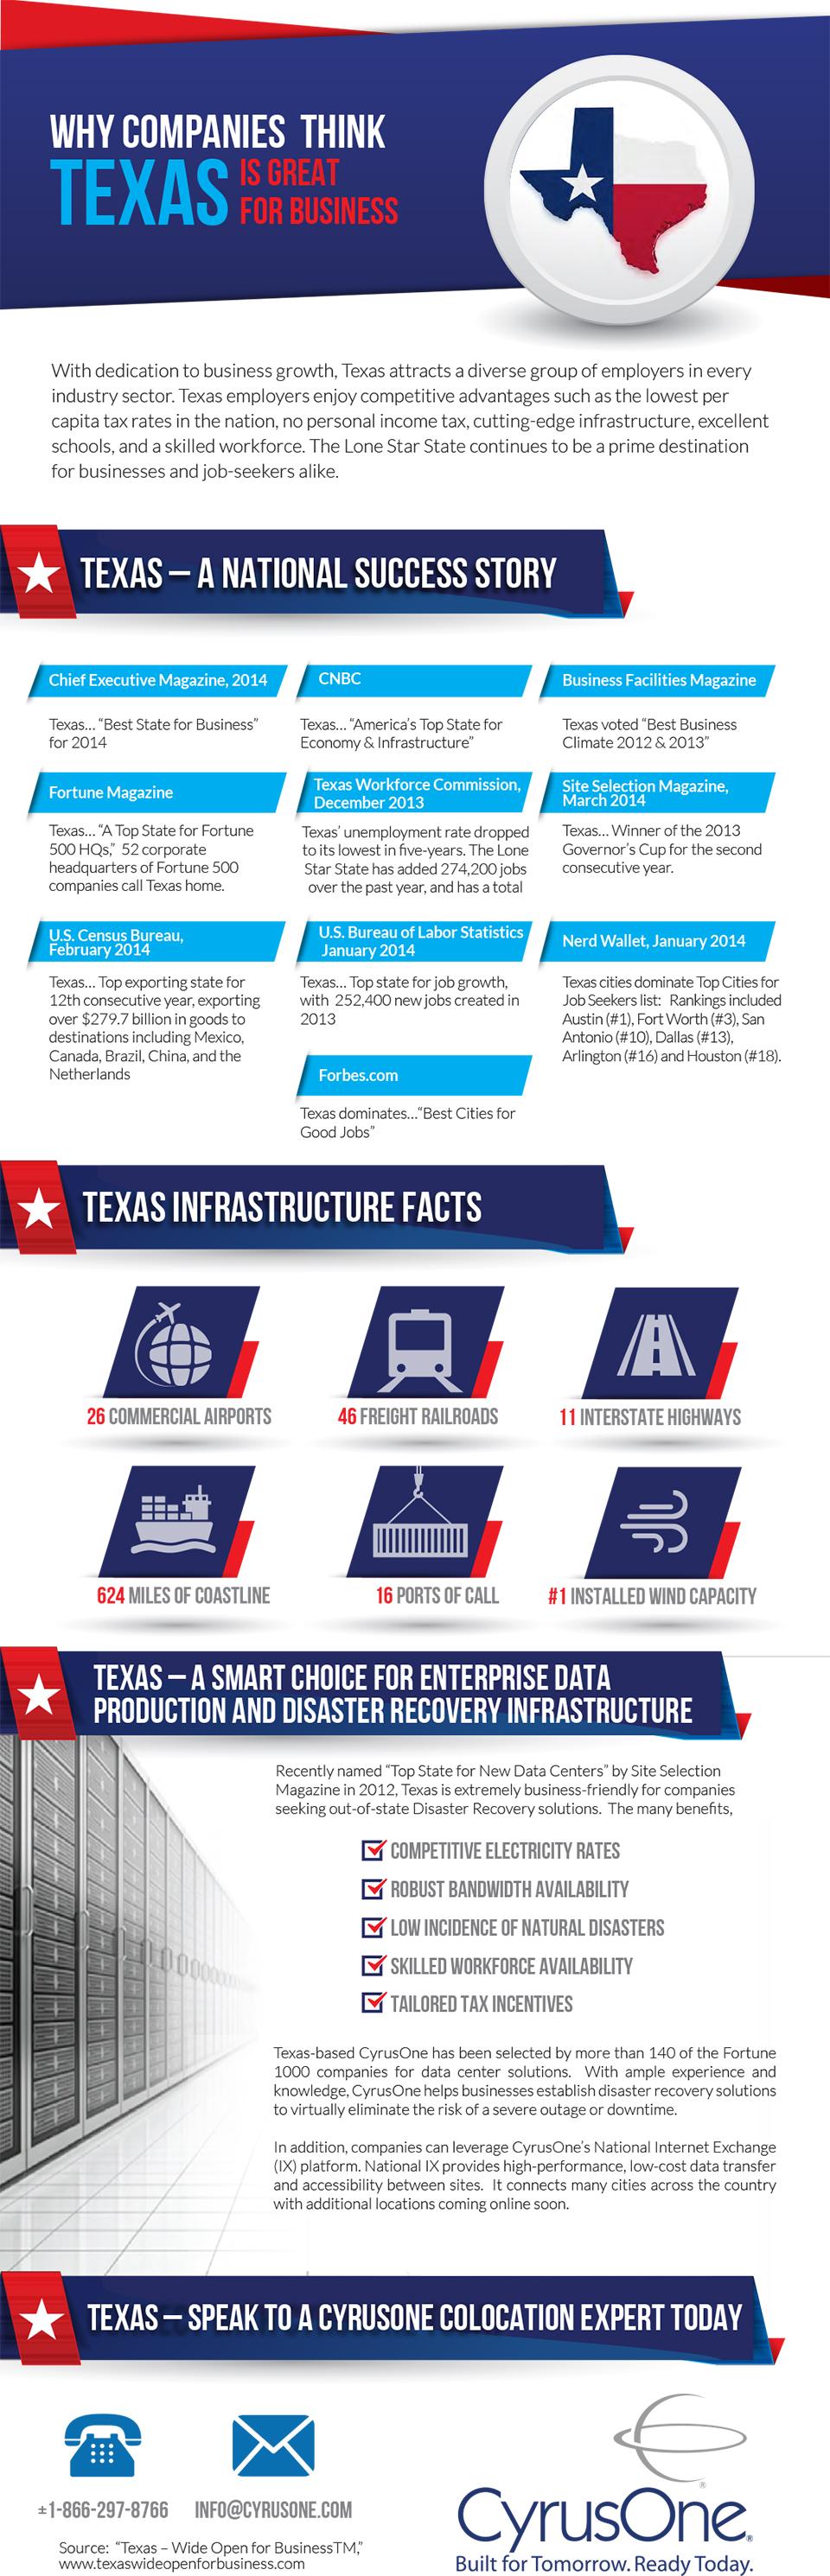 CyrusOne_Bigger In Texas Infographic